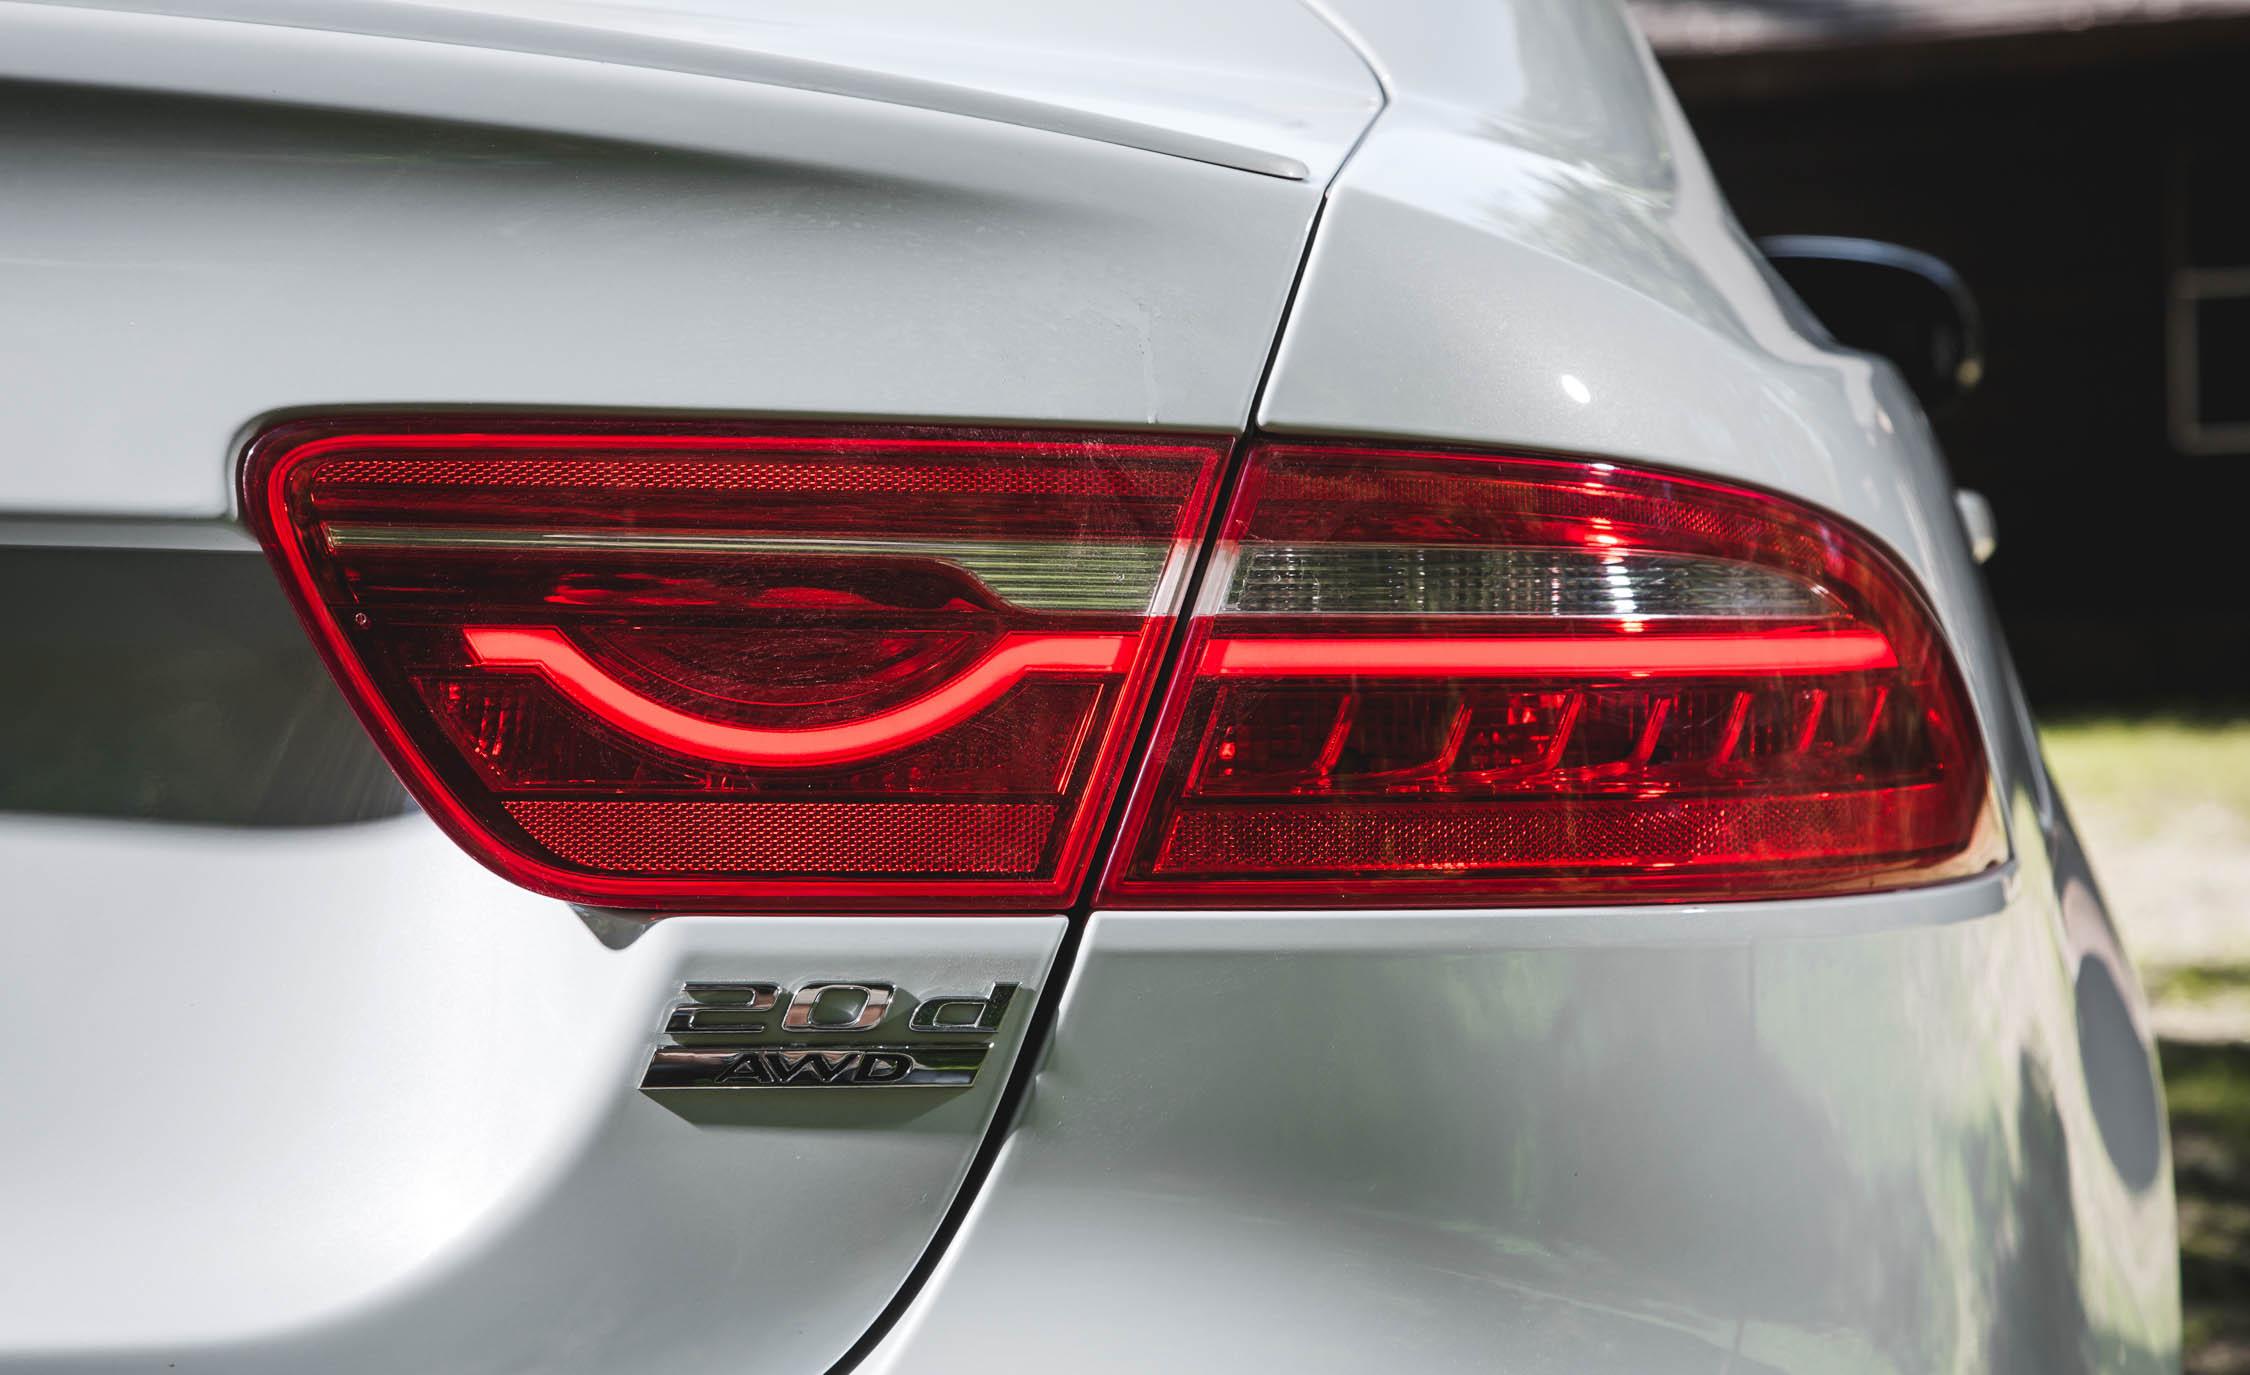 2017 Jaguar Xe Cars Exclusive Videos And Photos Updates